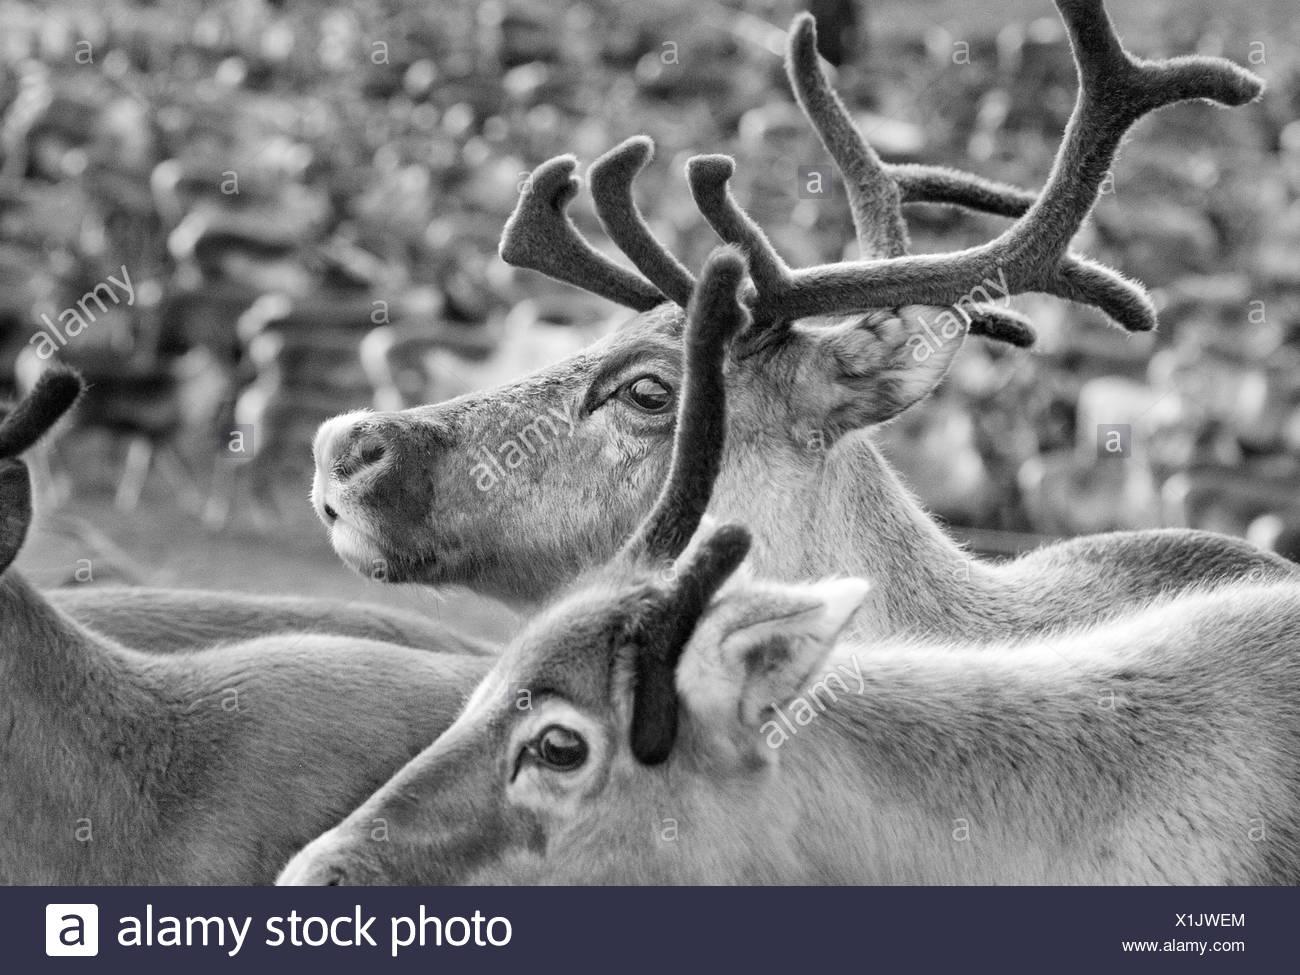 Sweden, Lapland, Levas, Close-up of herd of reindeer (Rangifer tarandus) - Stock Image